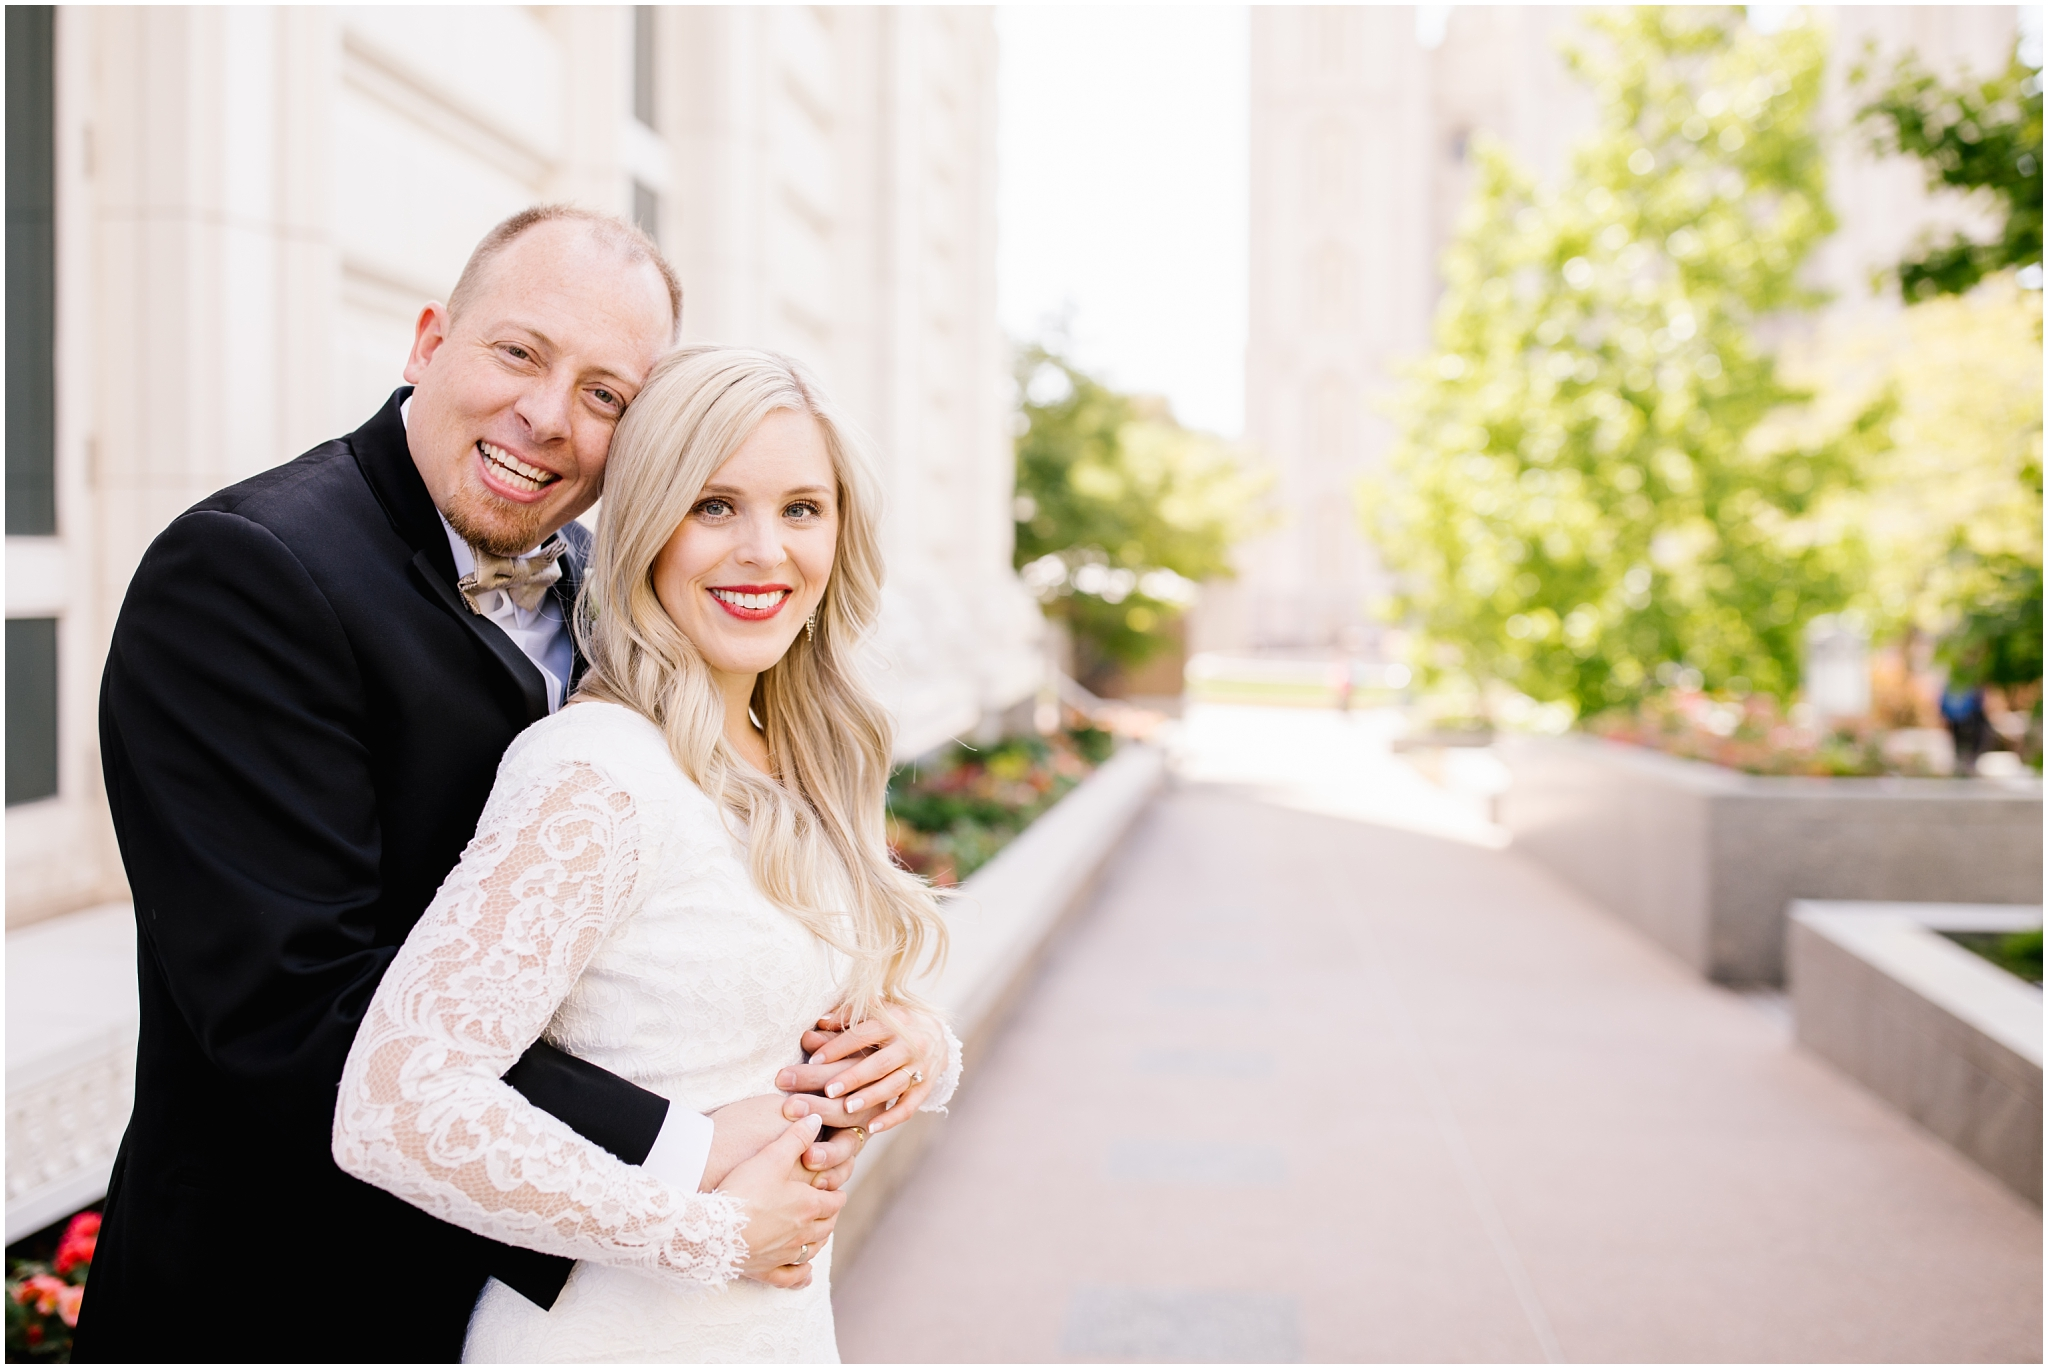 CherylandTyler-282_Lizzie-B-Imagery-Utah-Wedding-Photographer-Salt-Lake-City-Temple-Wells-Fargo-Building-Reception.jpg